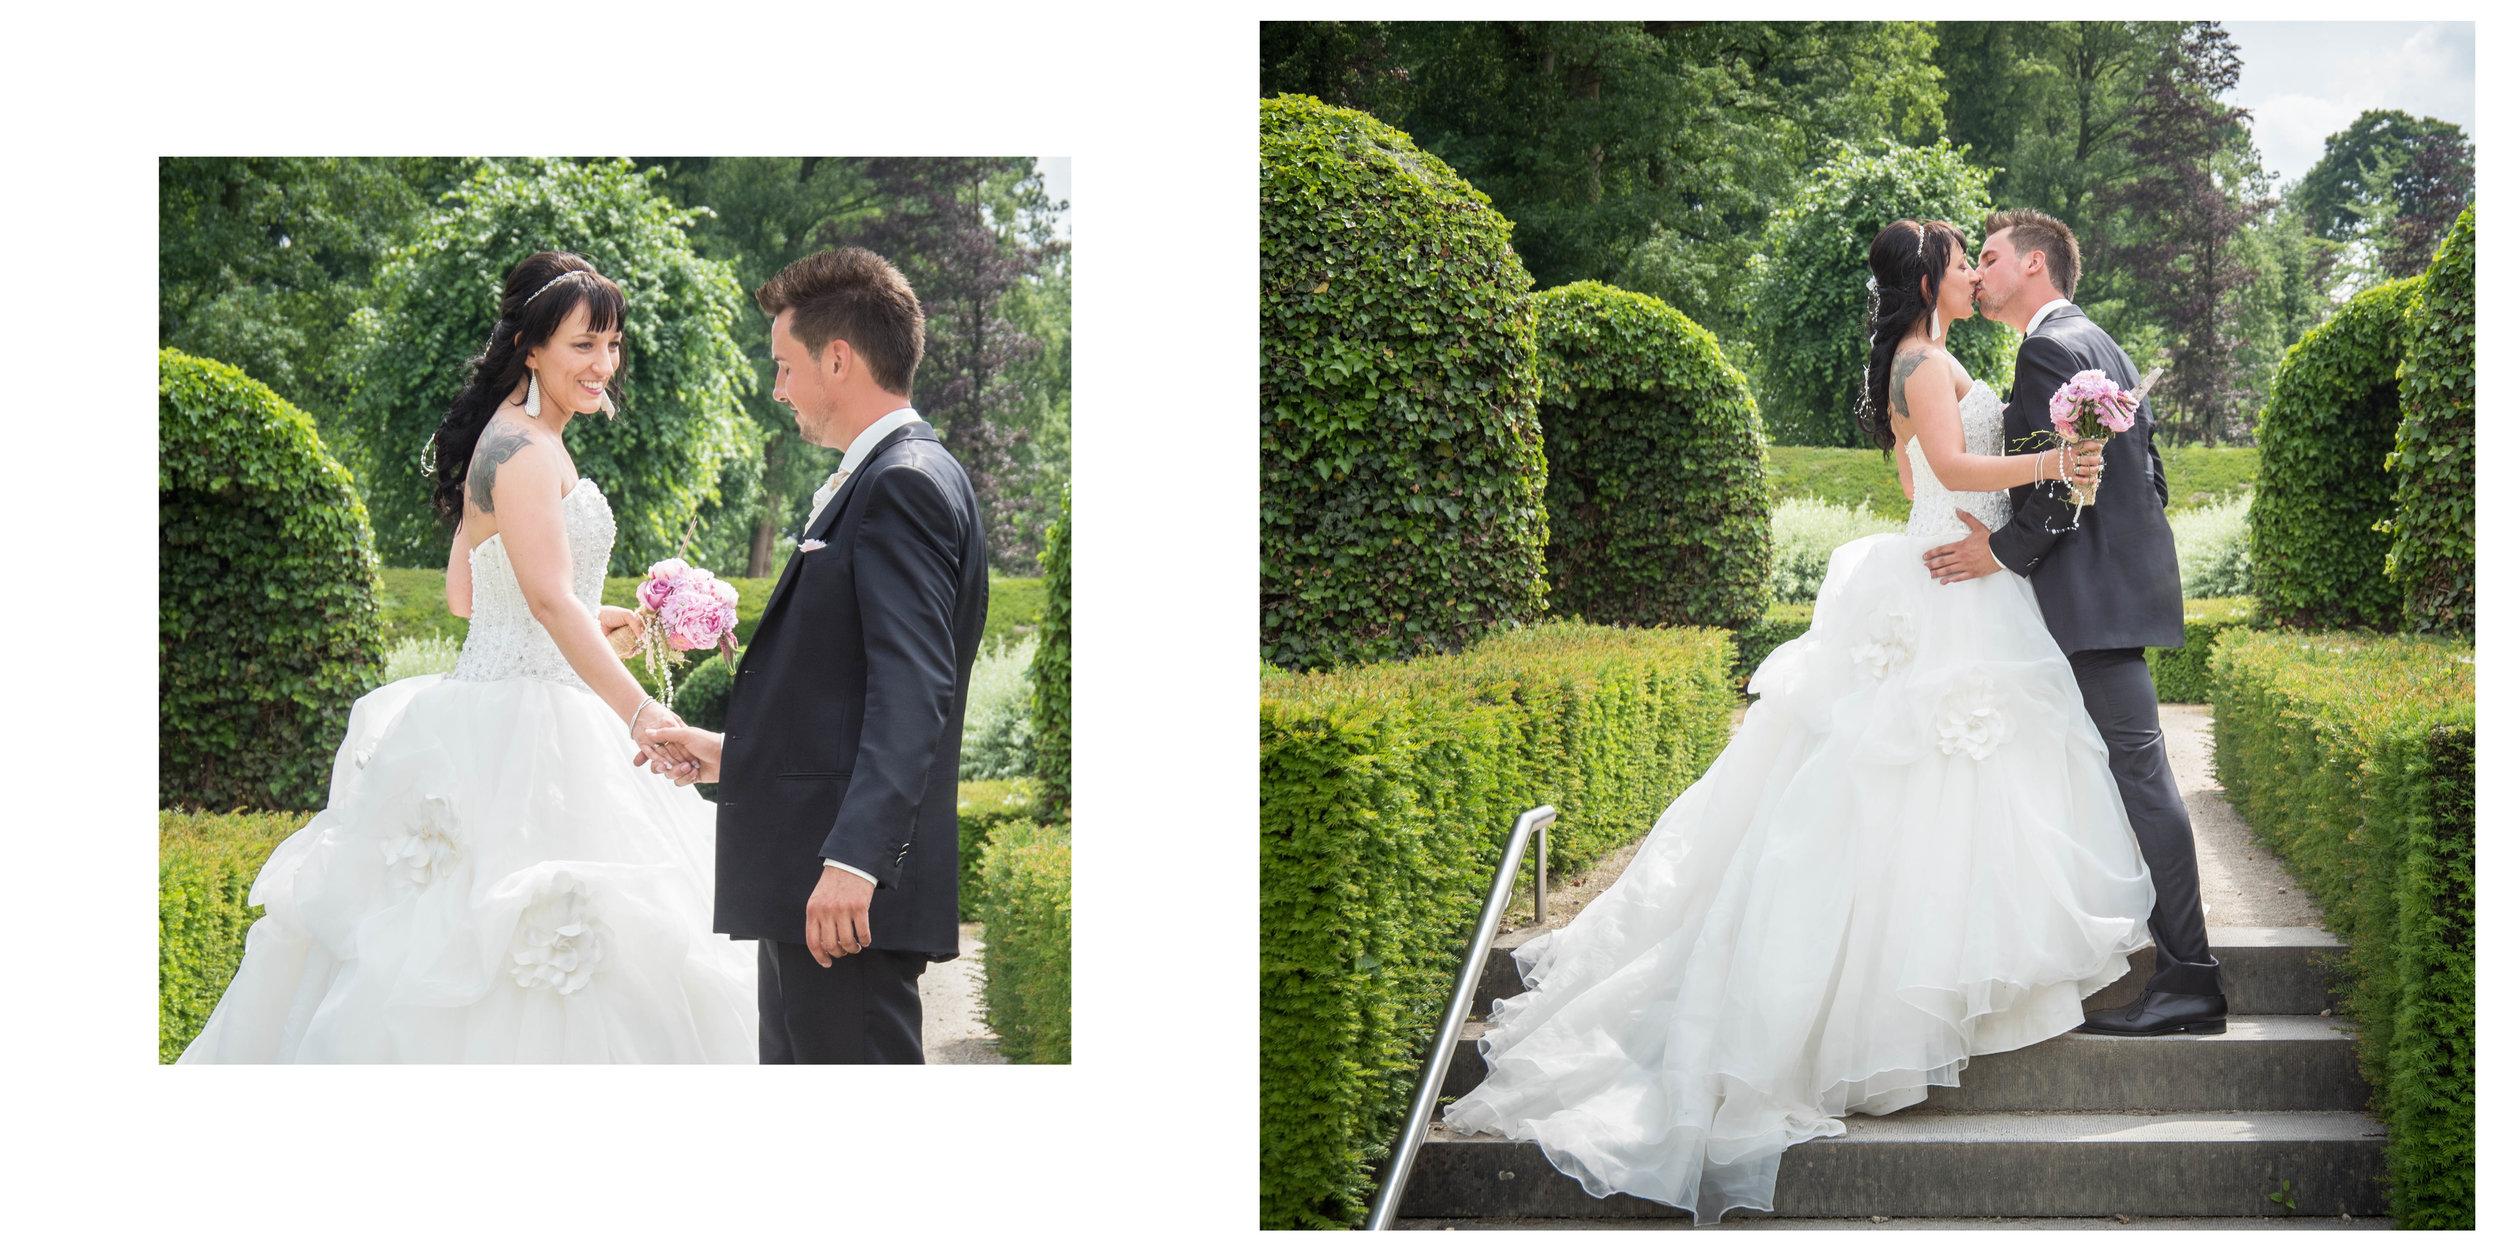 Huwelijksfotograaf Limburg Bilzen - World Pigeon Center, De Loft, Hoeselt